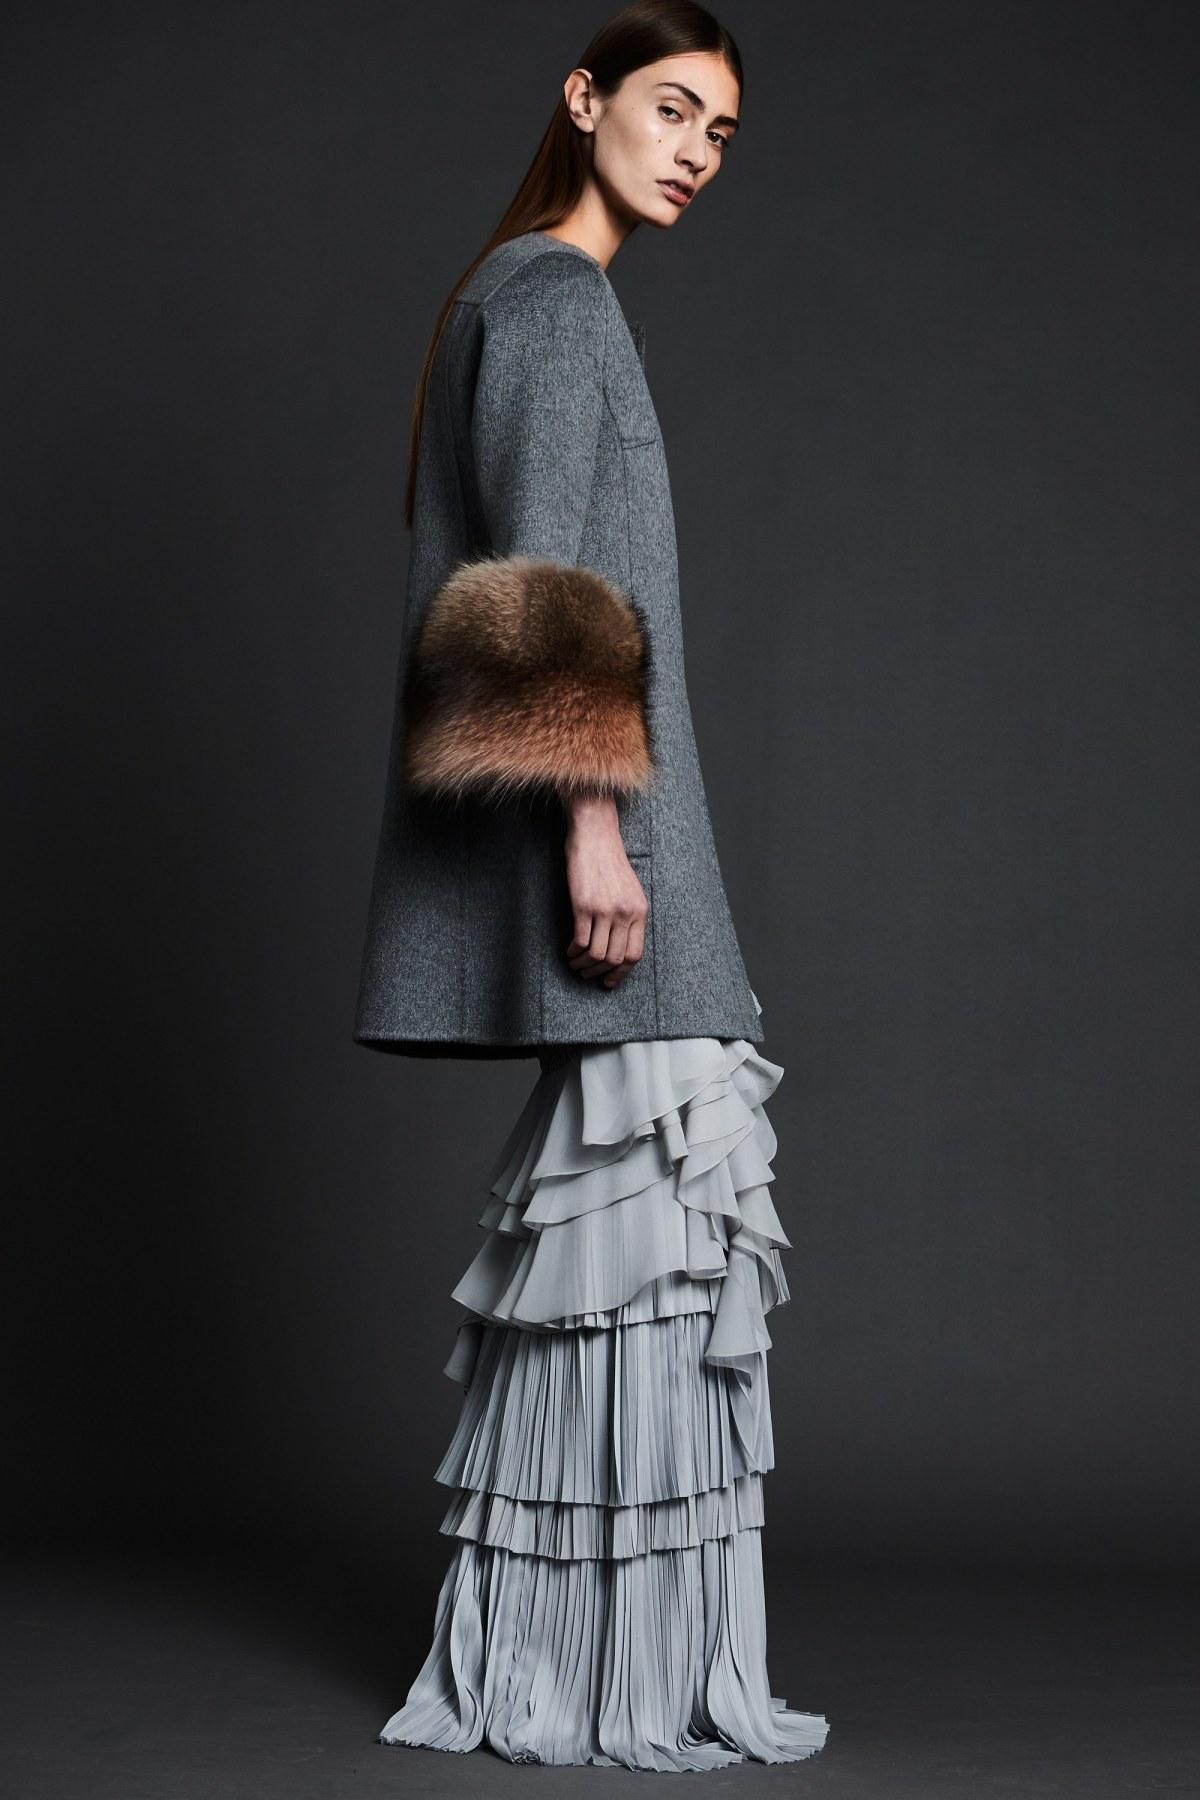 j-mendel-pre-fall-2017-fashion-show-the-impression-09